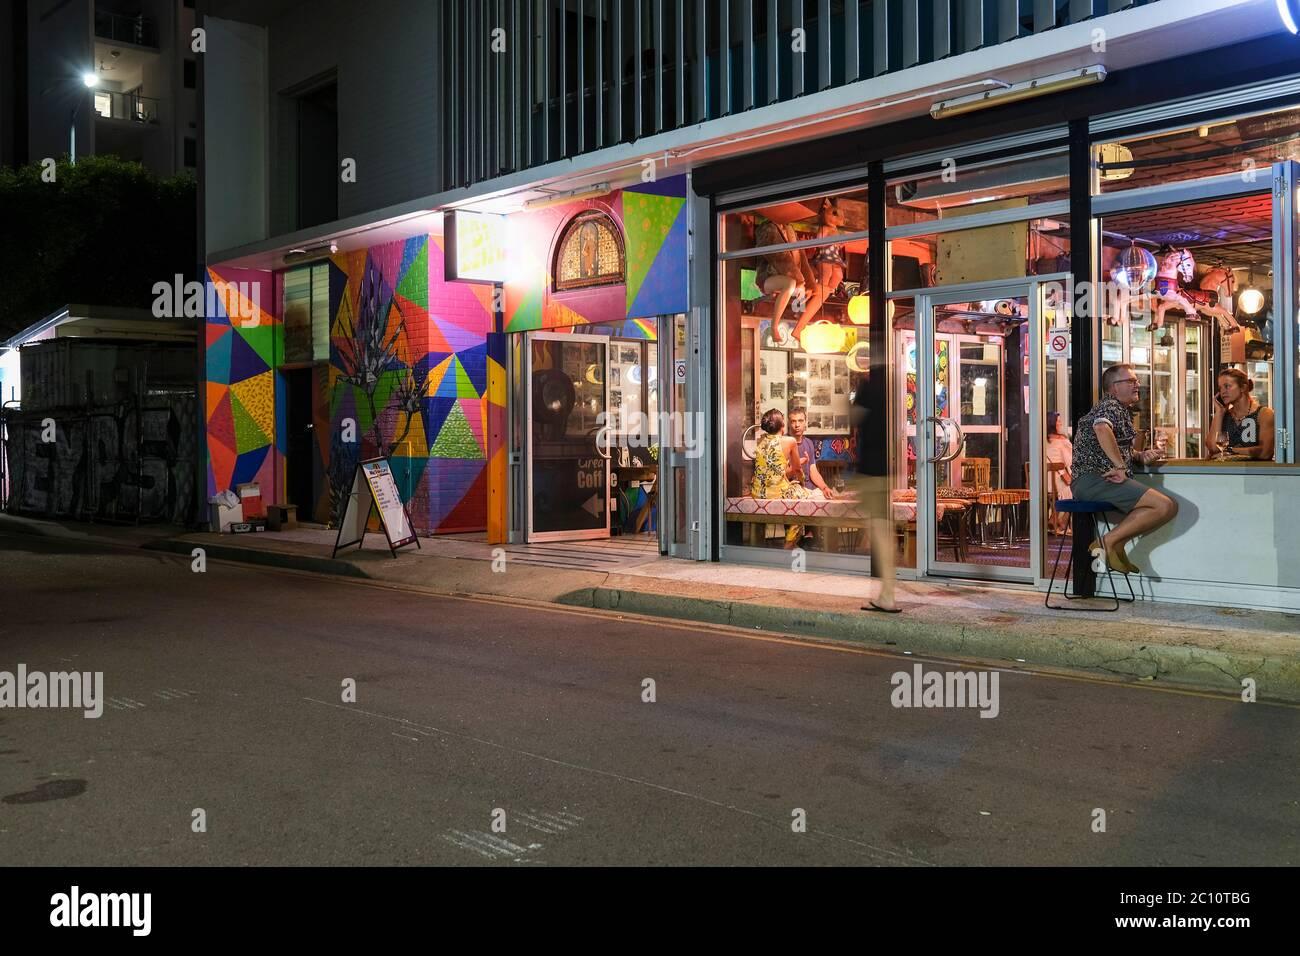 nightlife-at-the-air-raid-arcade-from-au